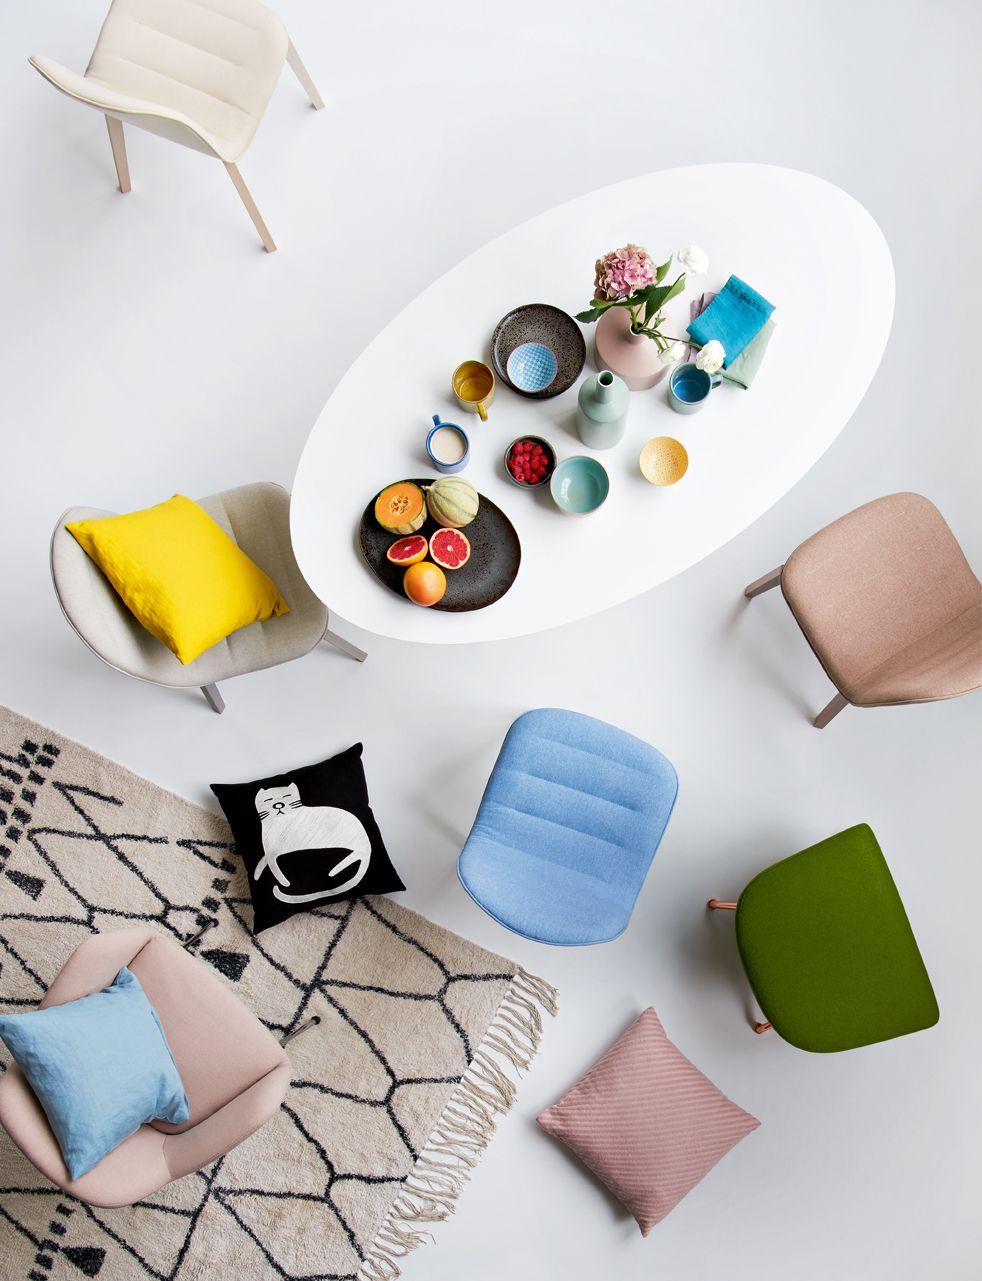 Dieser Fruhling Bluht Mit Stil Interio Fruhling2017 Tisch Stuhle